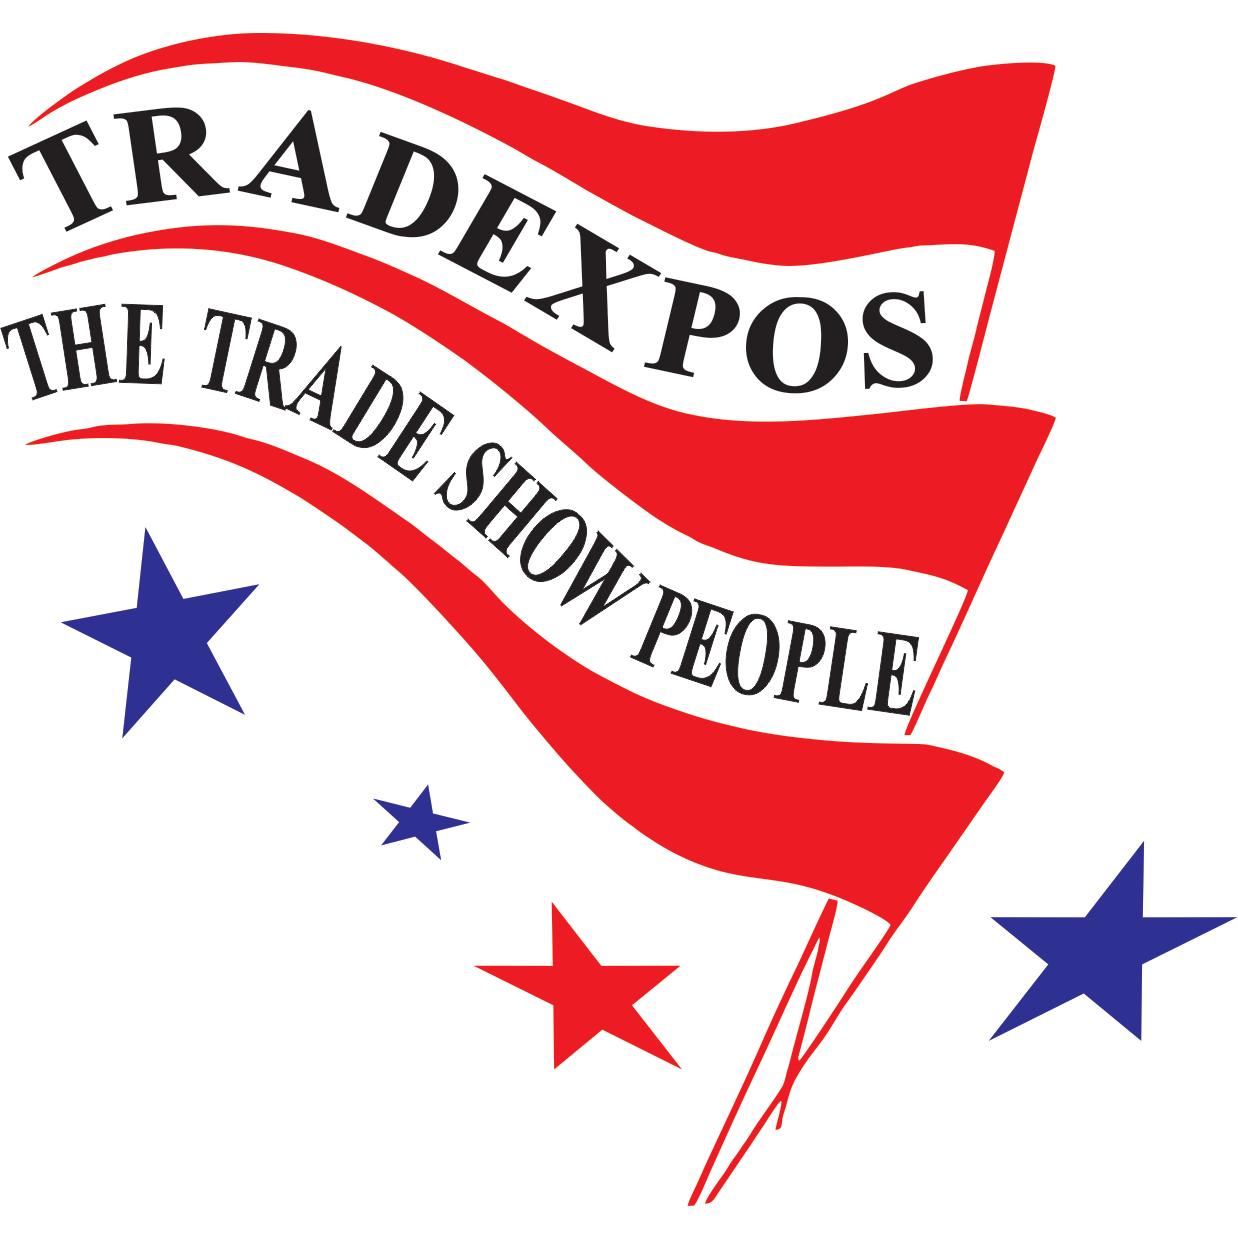 Tradexpos, Inc. image 5